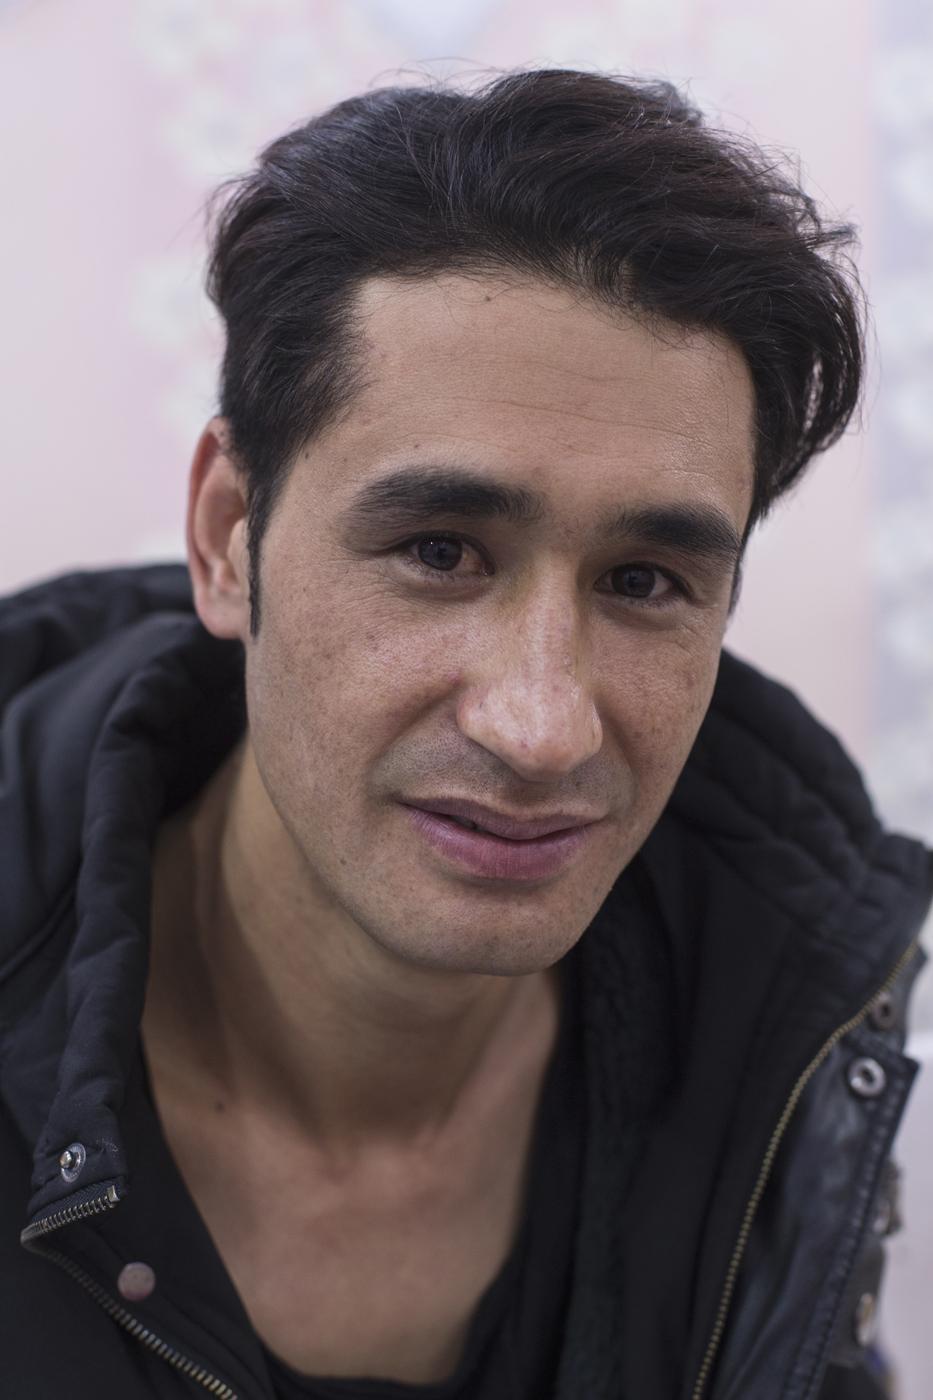 Alimadad Naseri